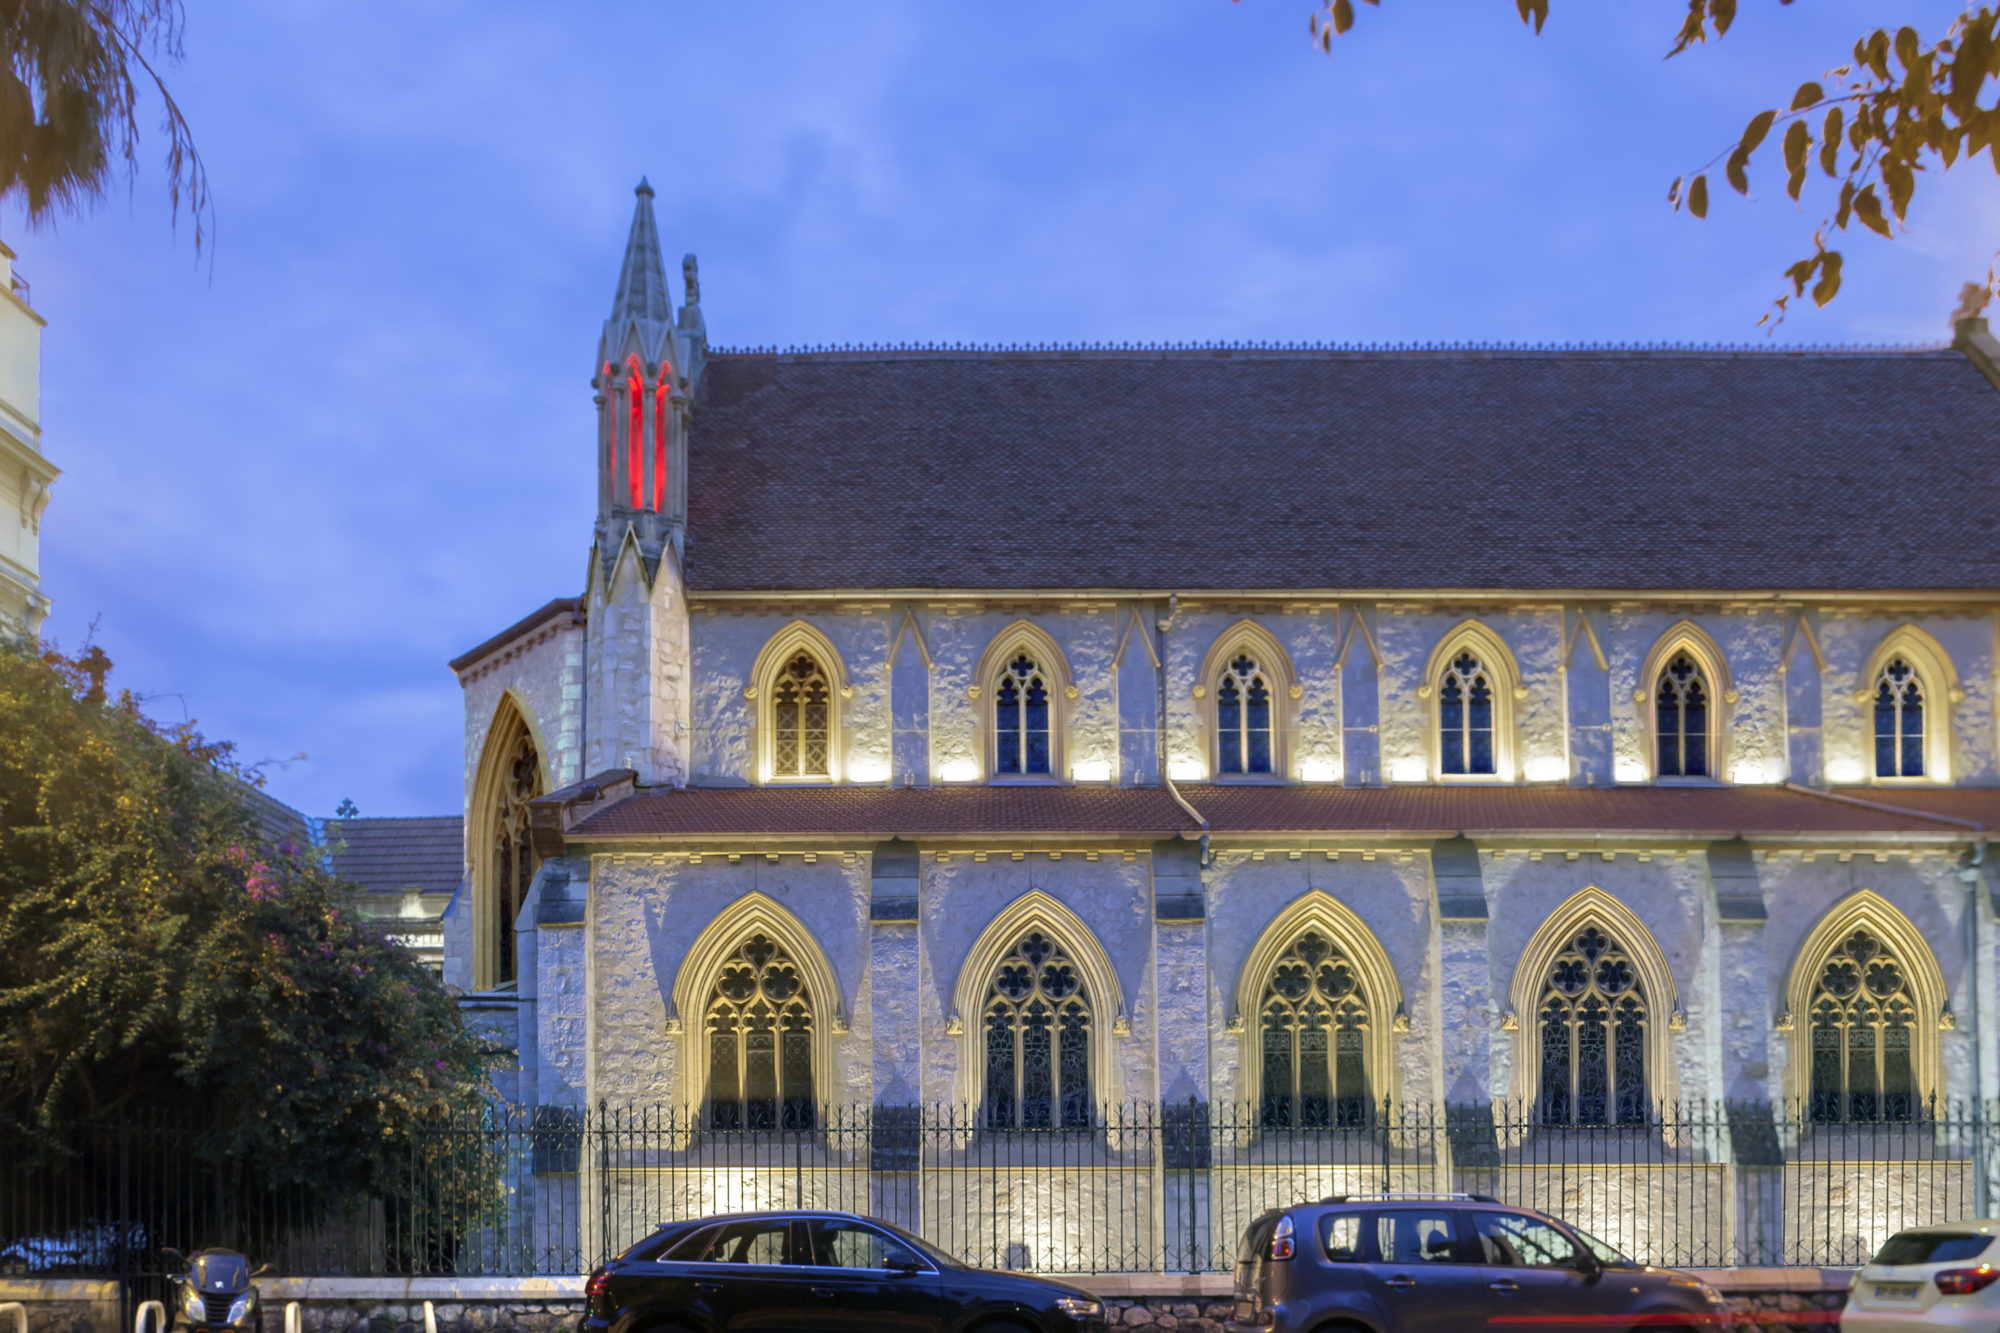 facade eglise nuit, facade eglise anglicane illuminee nuit nice